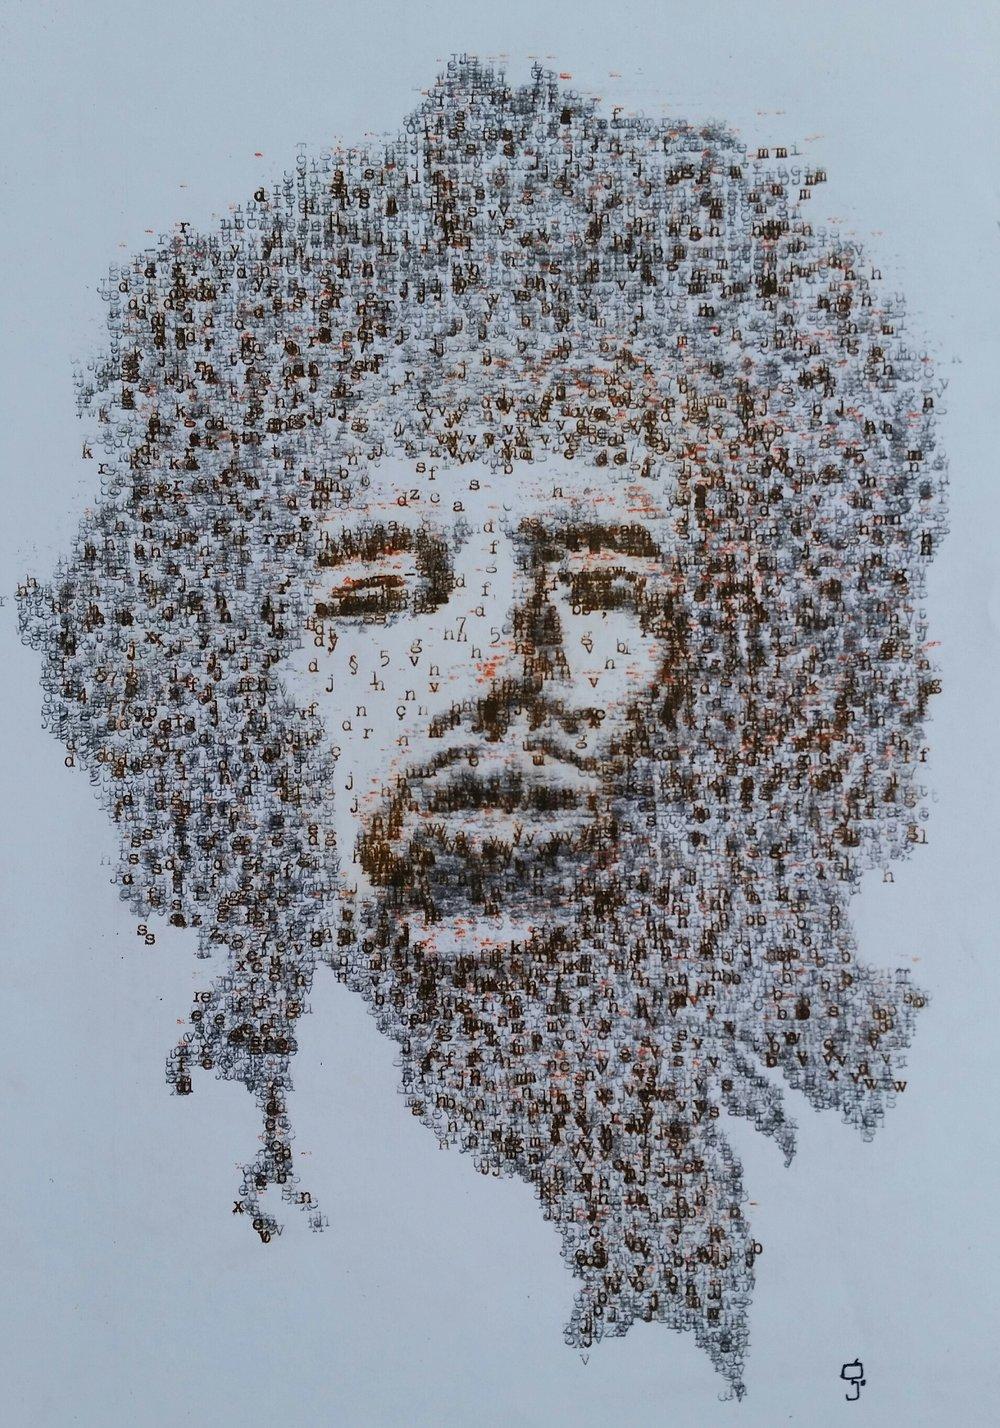 Hendrix_typewriter.jpg-2.jpg